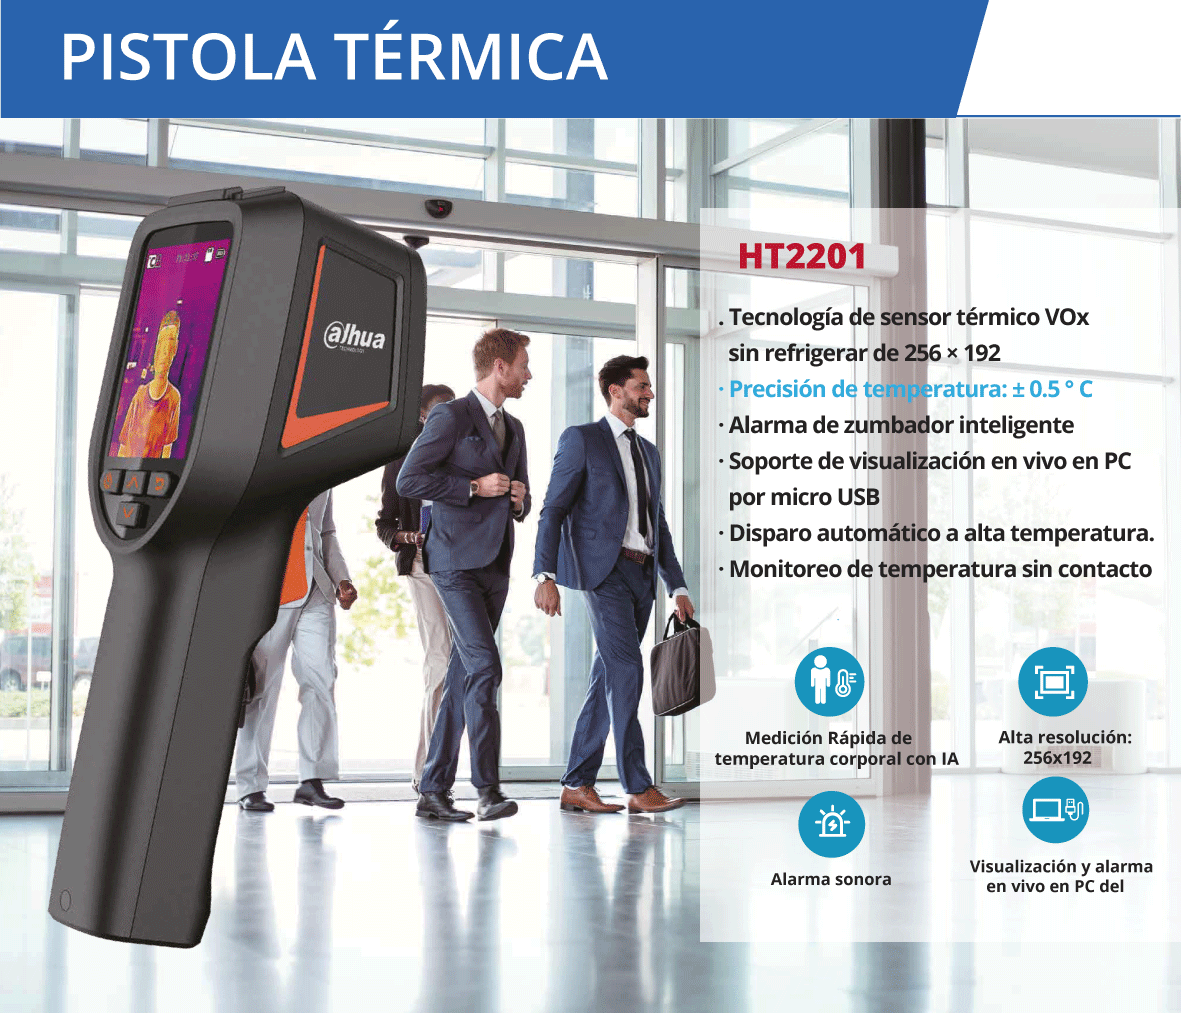 pistola-termica